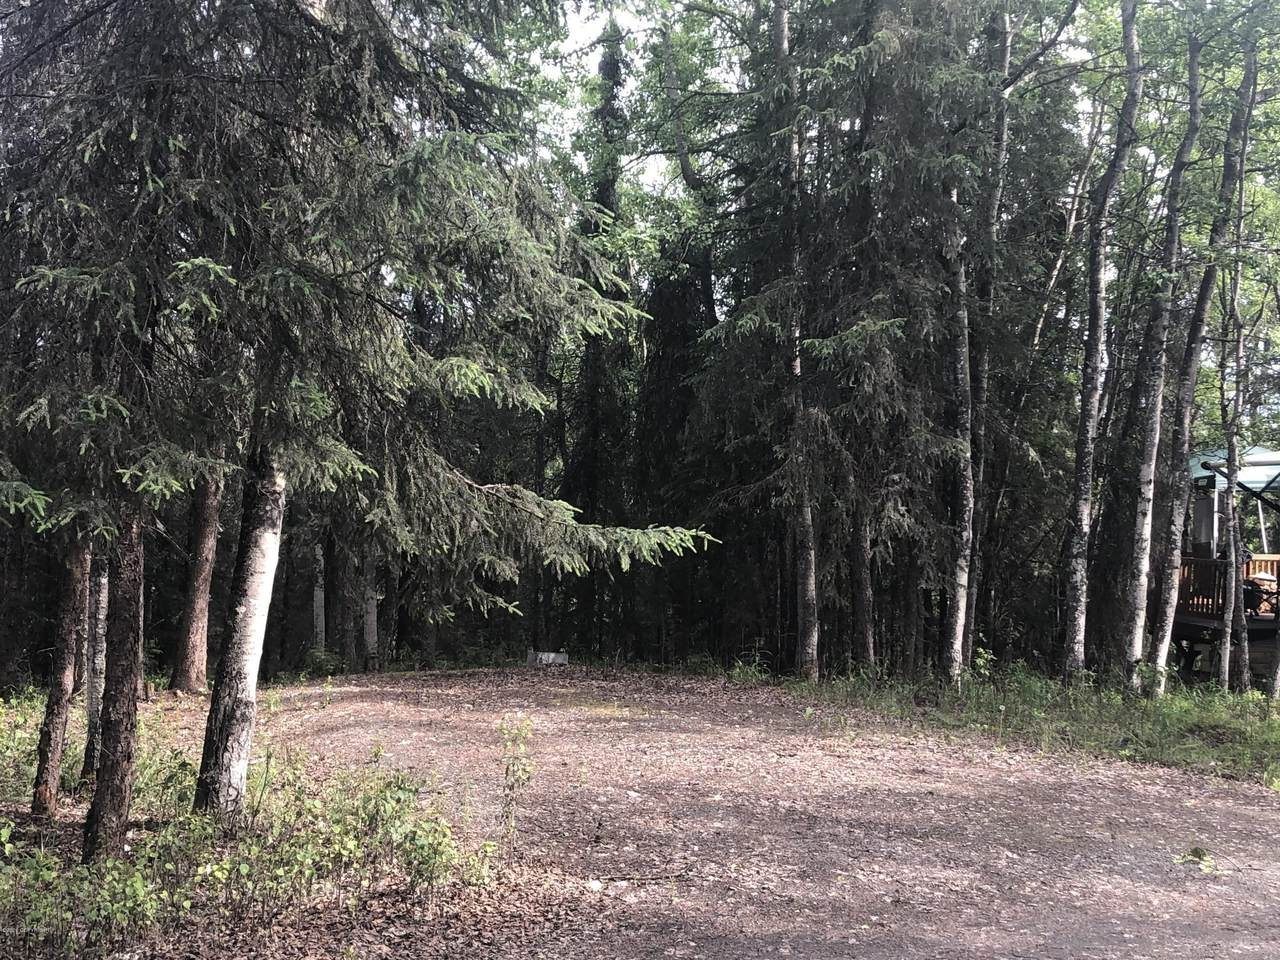 https://bt-photos.global.ssl.fastly.net/alaska/1280_boomver_1_20-9878-2.jpg